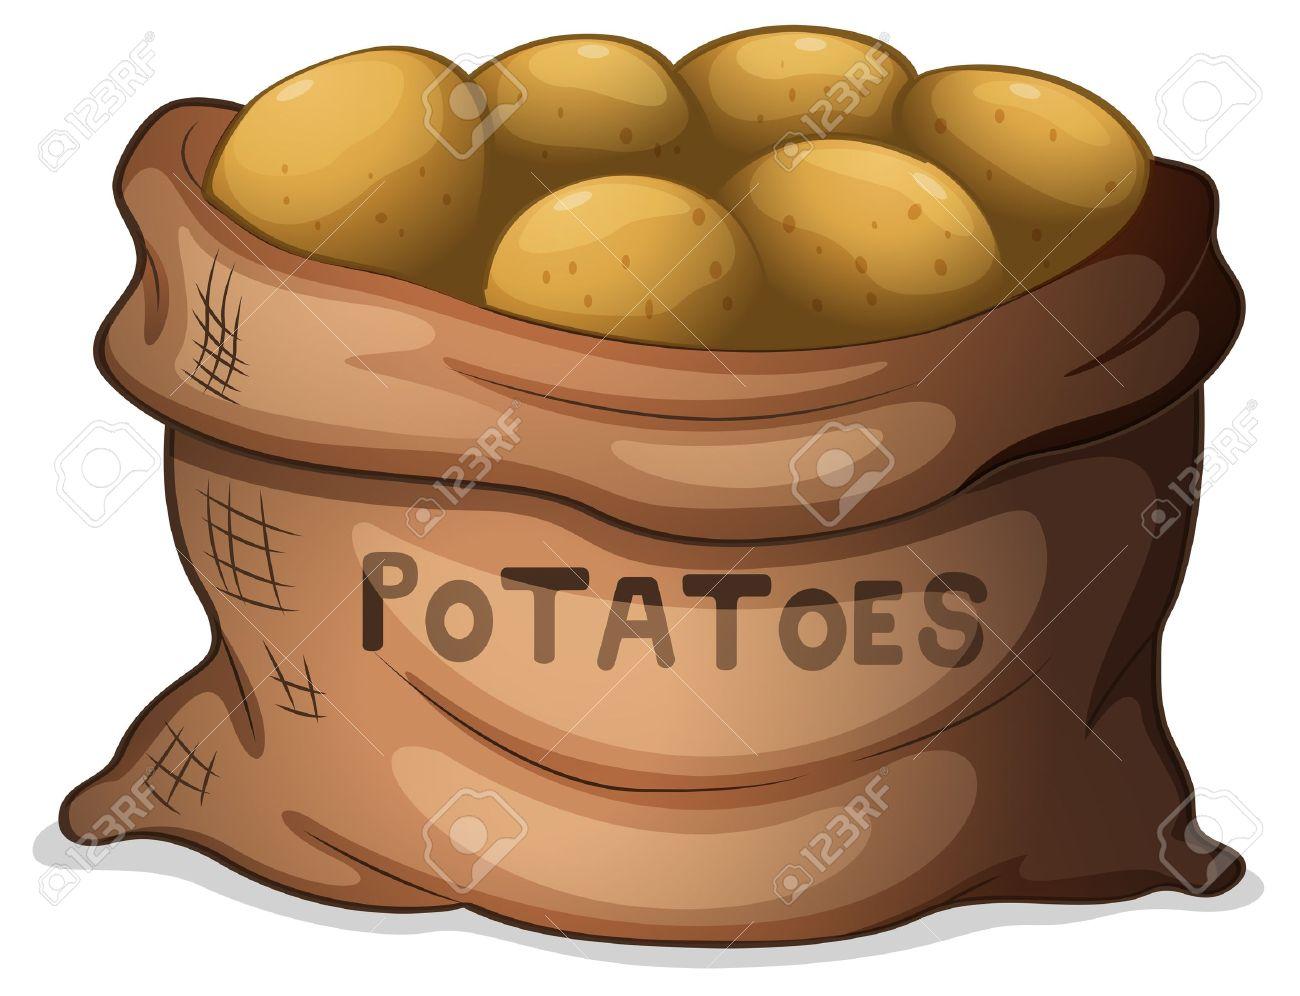 Мешки с картошкой рисунок